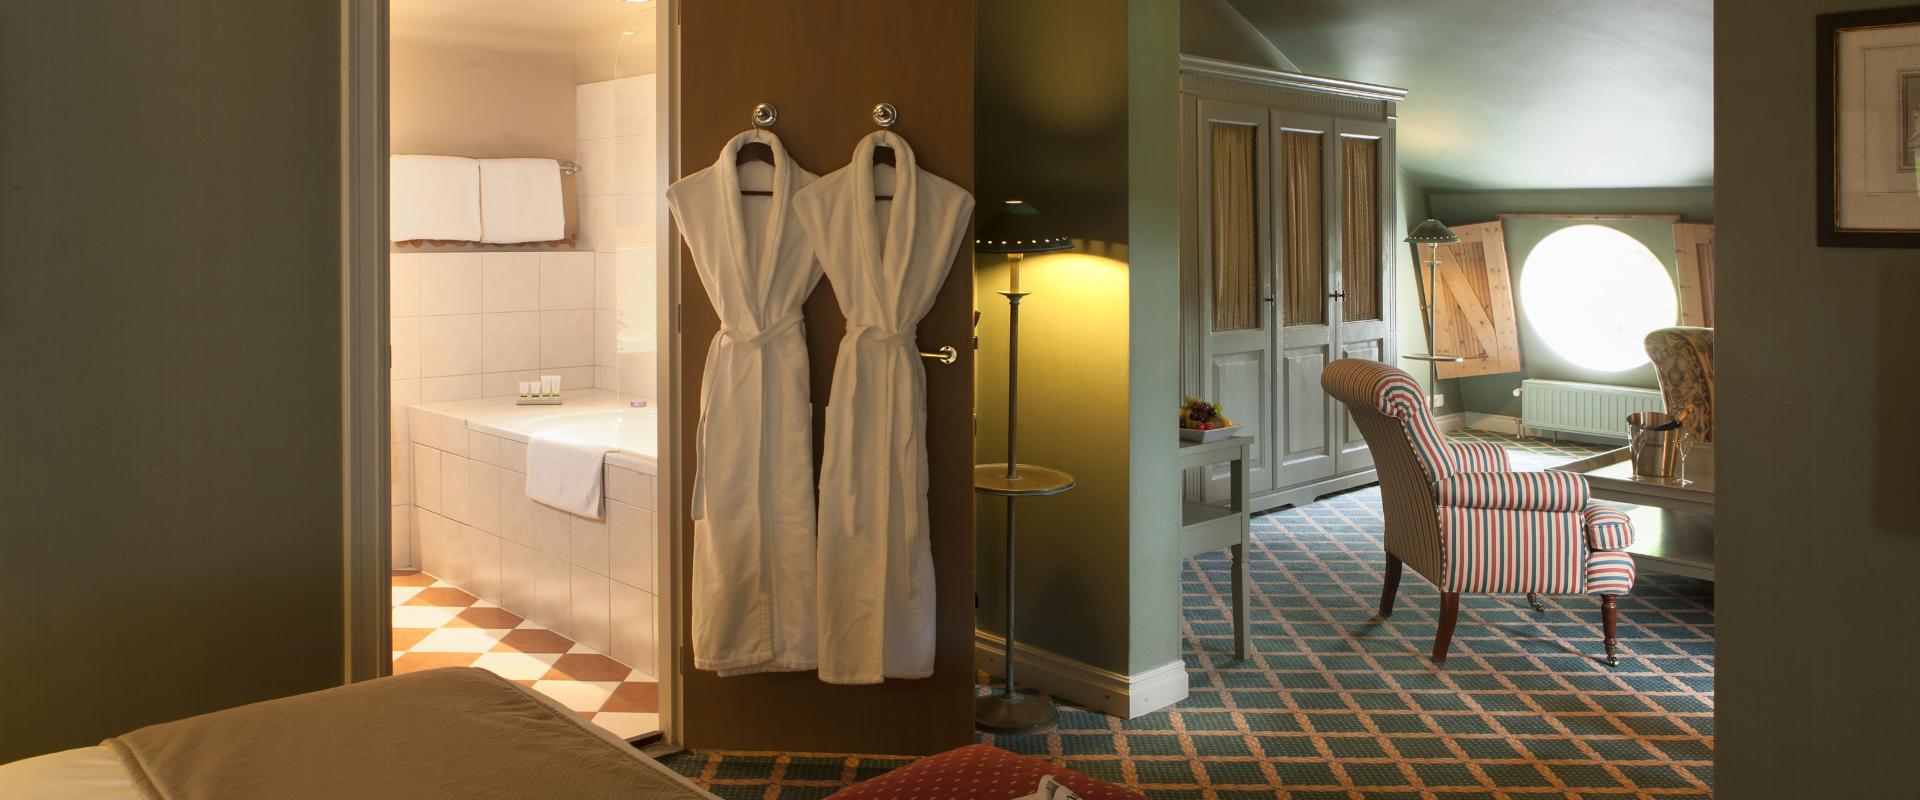 Residential suite ch teau st gerlach for Designhotel maastricht comfort xl